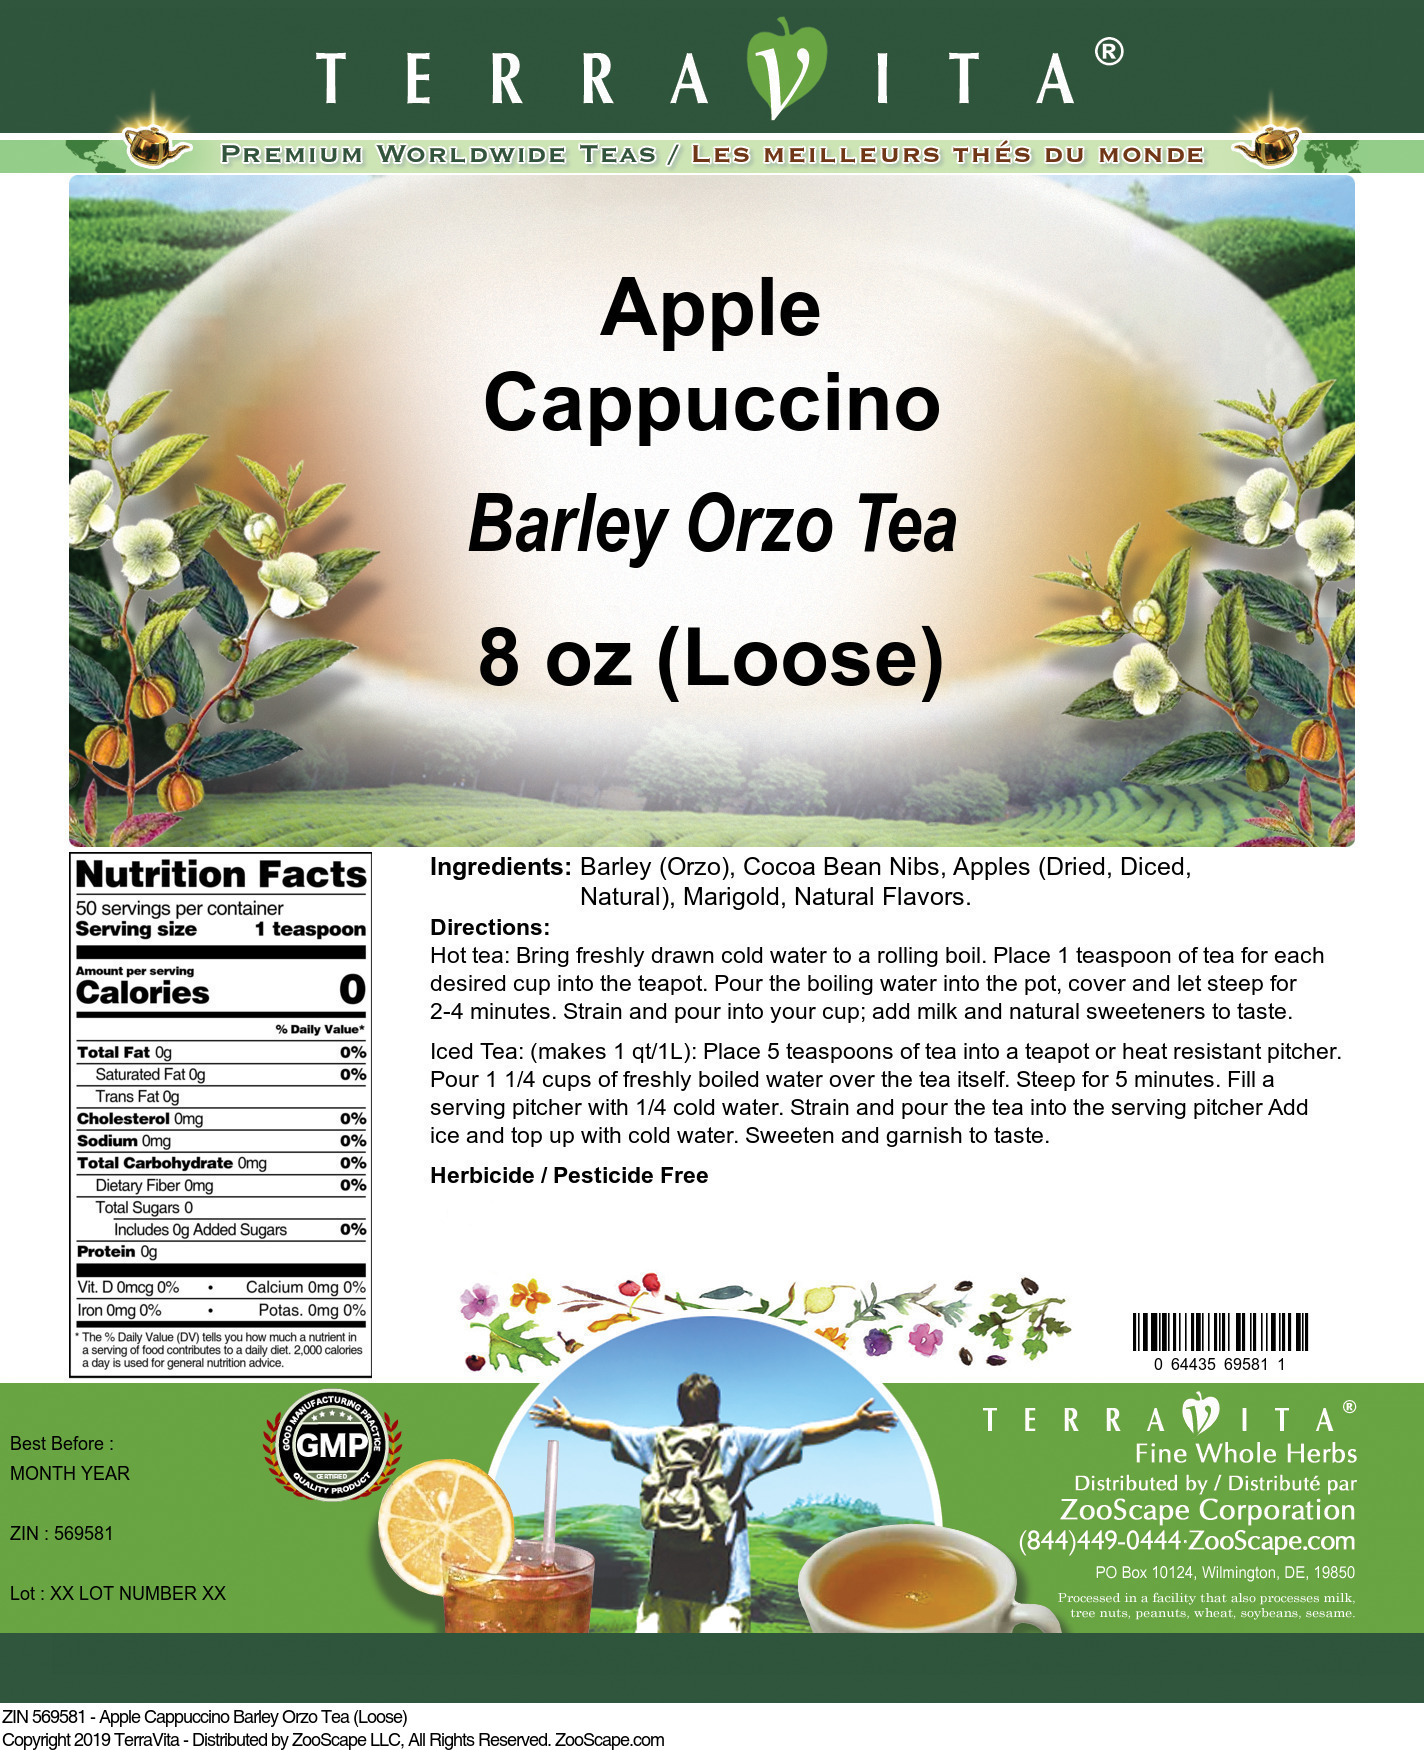 Apple Cappuccino Barley Orzo